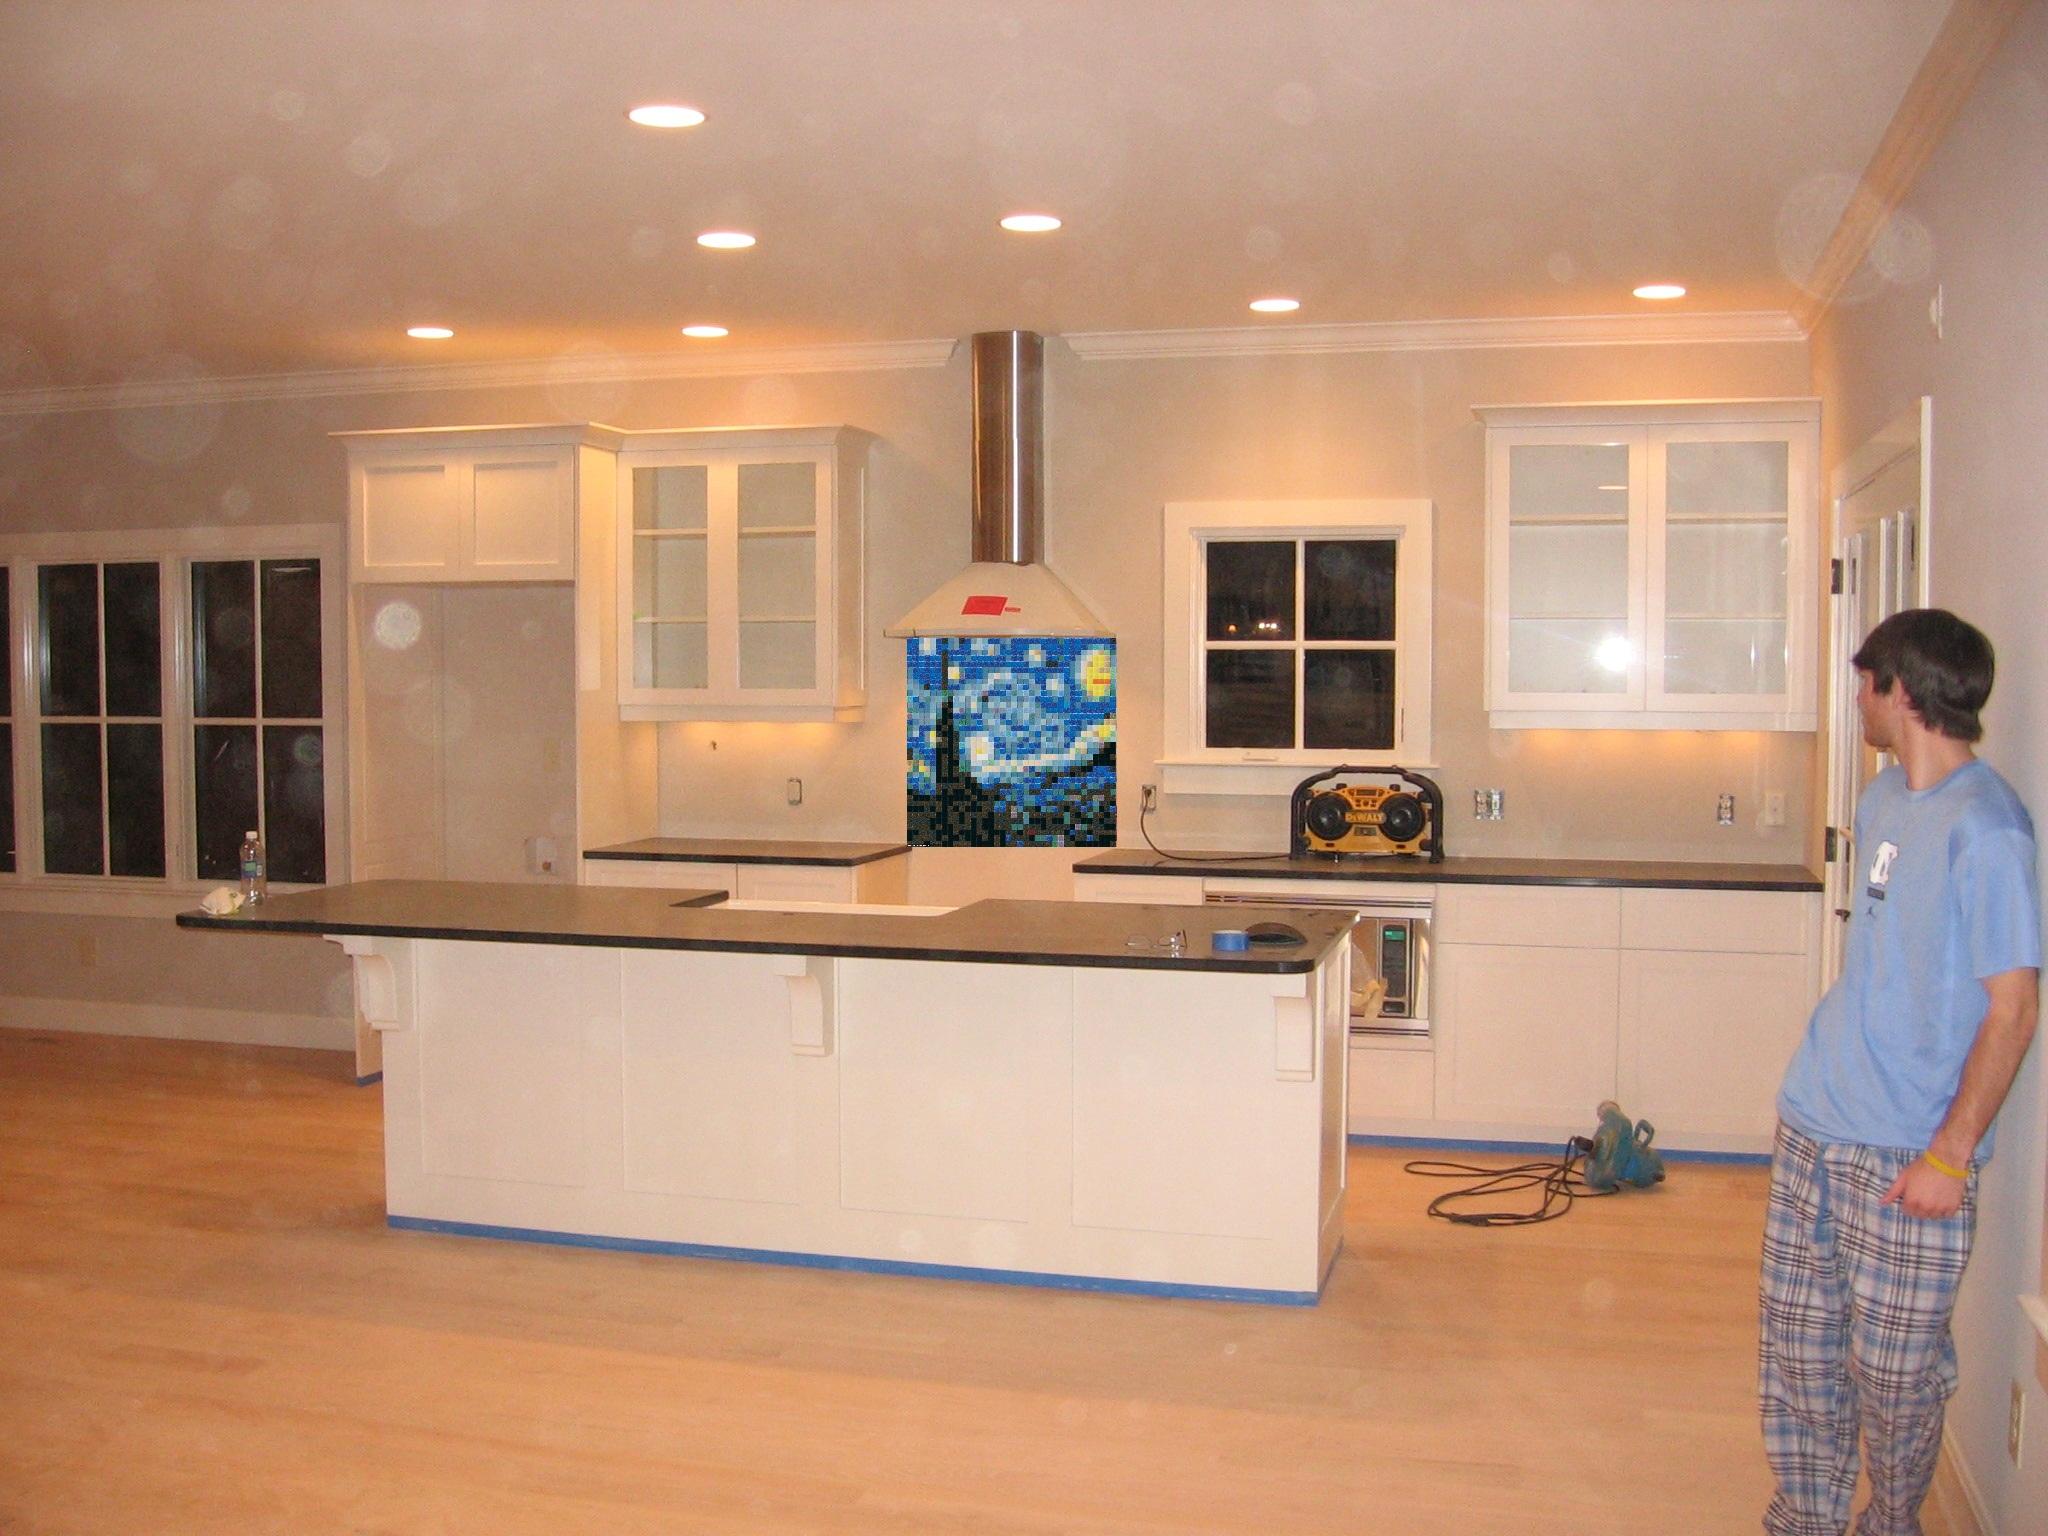 b_kitchen_final-starry.JPG